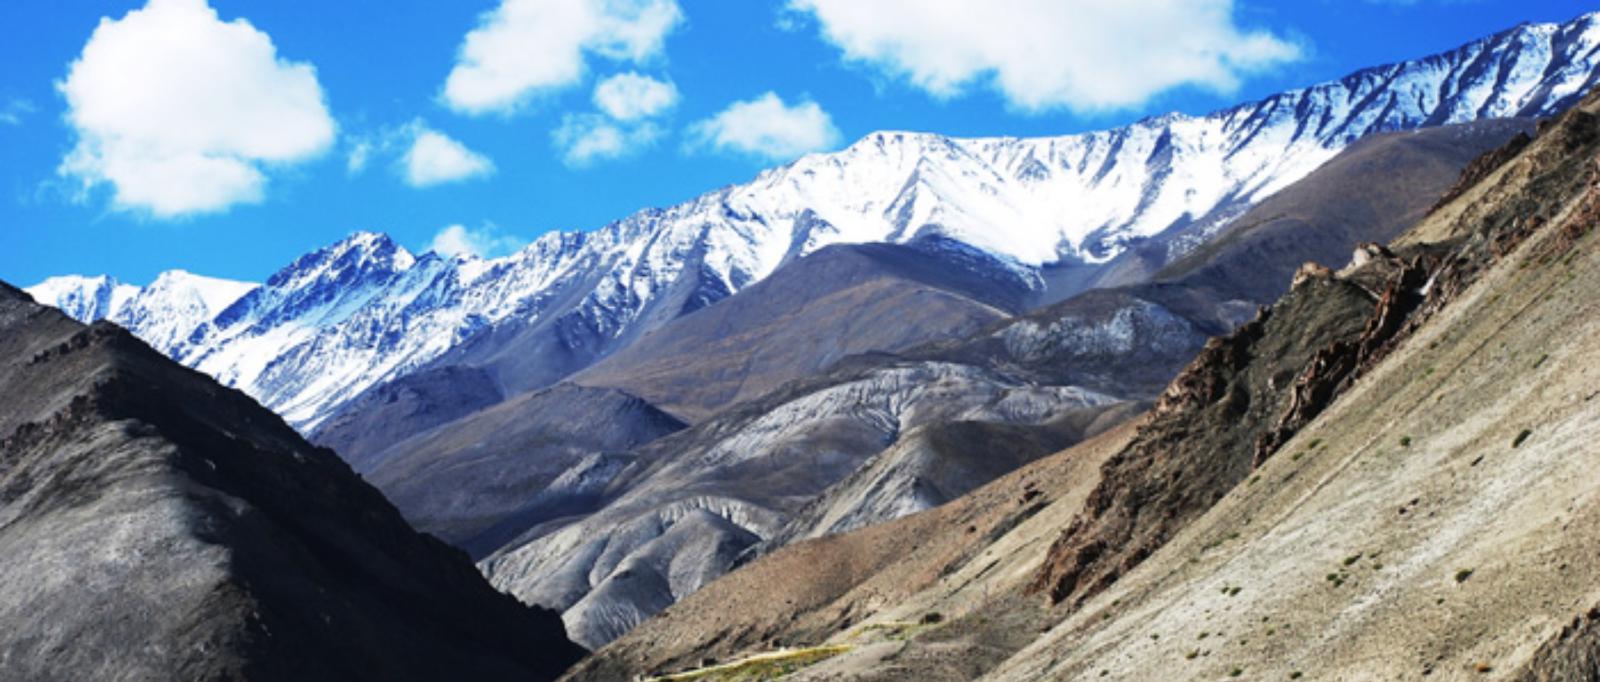 Tibetan Sand Grouse